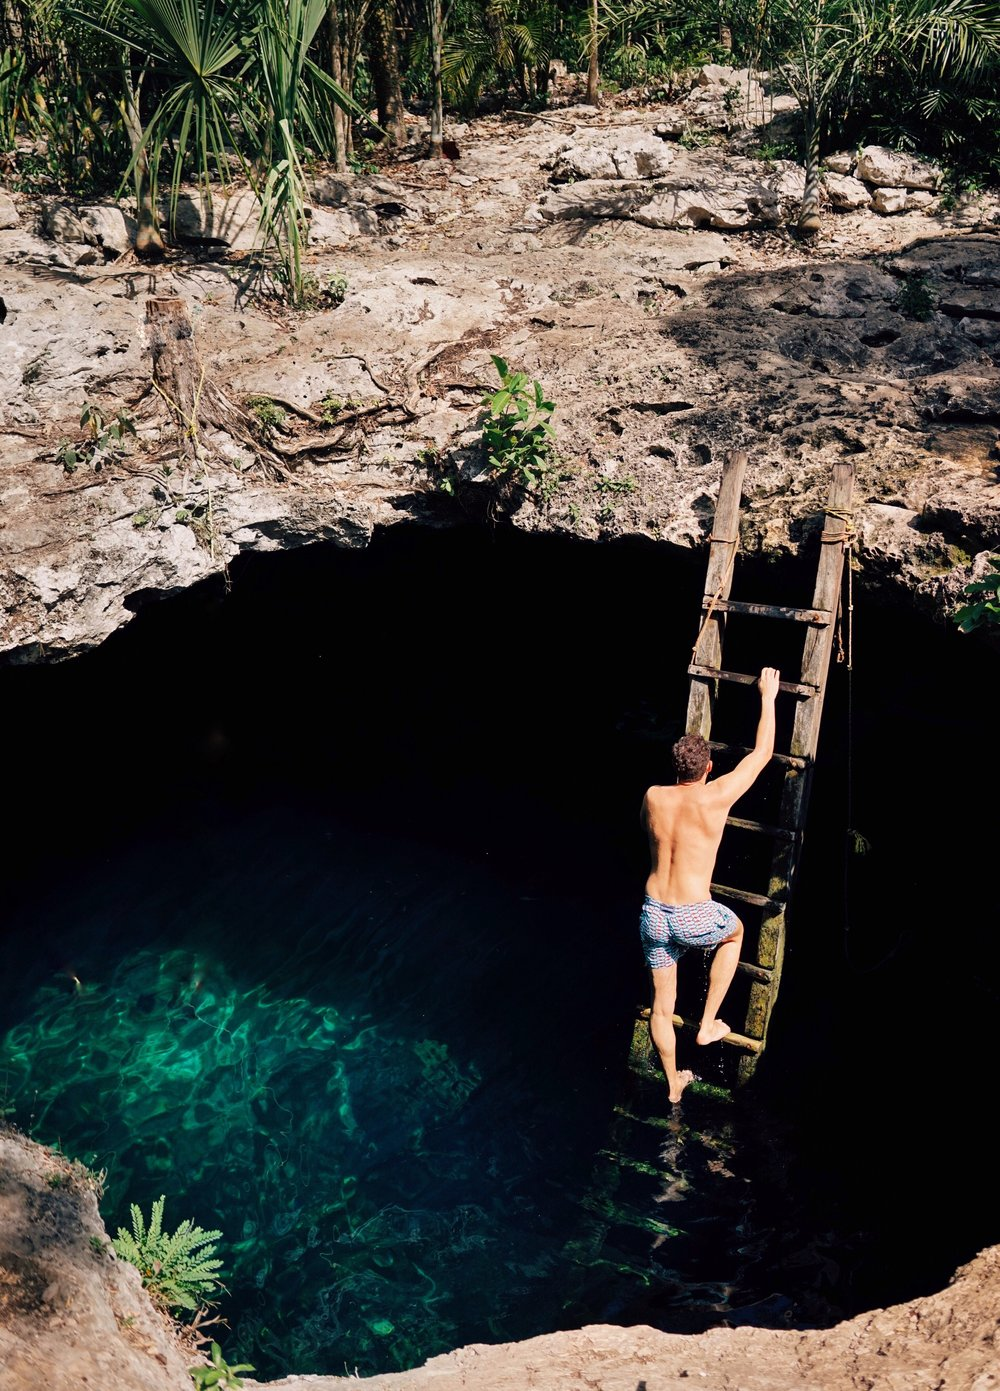 Cenote Calavera - wearing Vilebrequin trunks